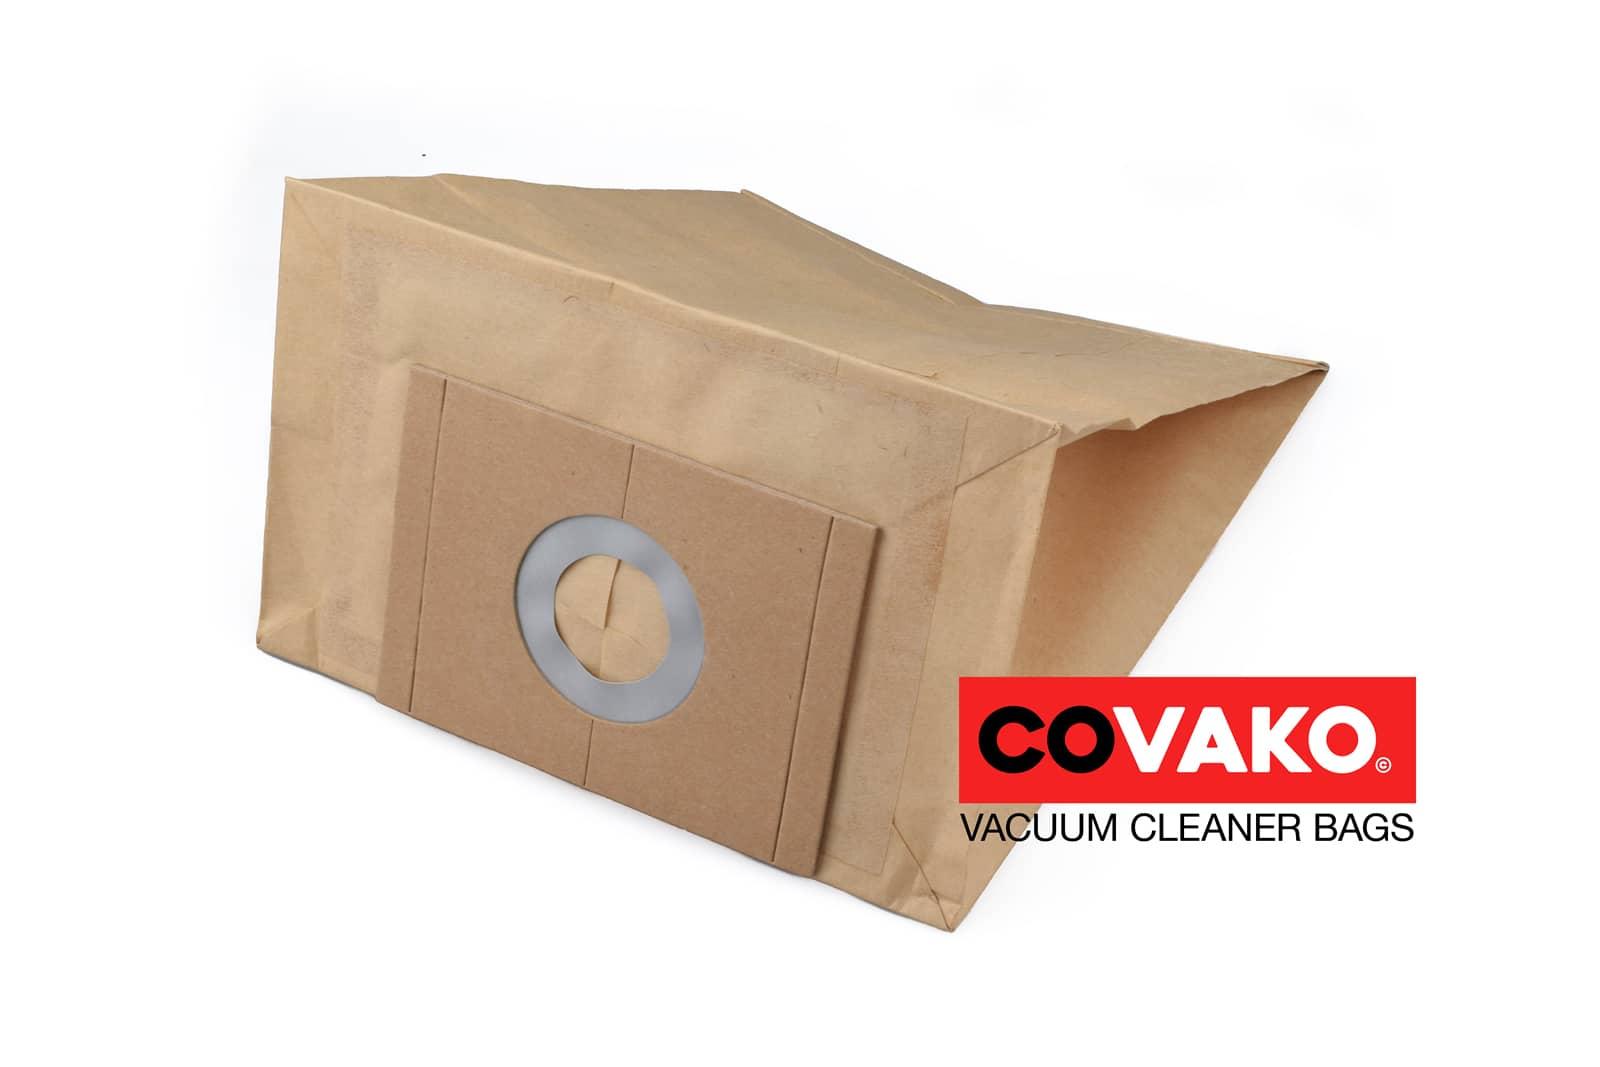 Sorma SM 110 / Papier - Sorma sacs d'aspirateur